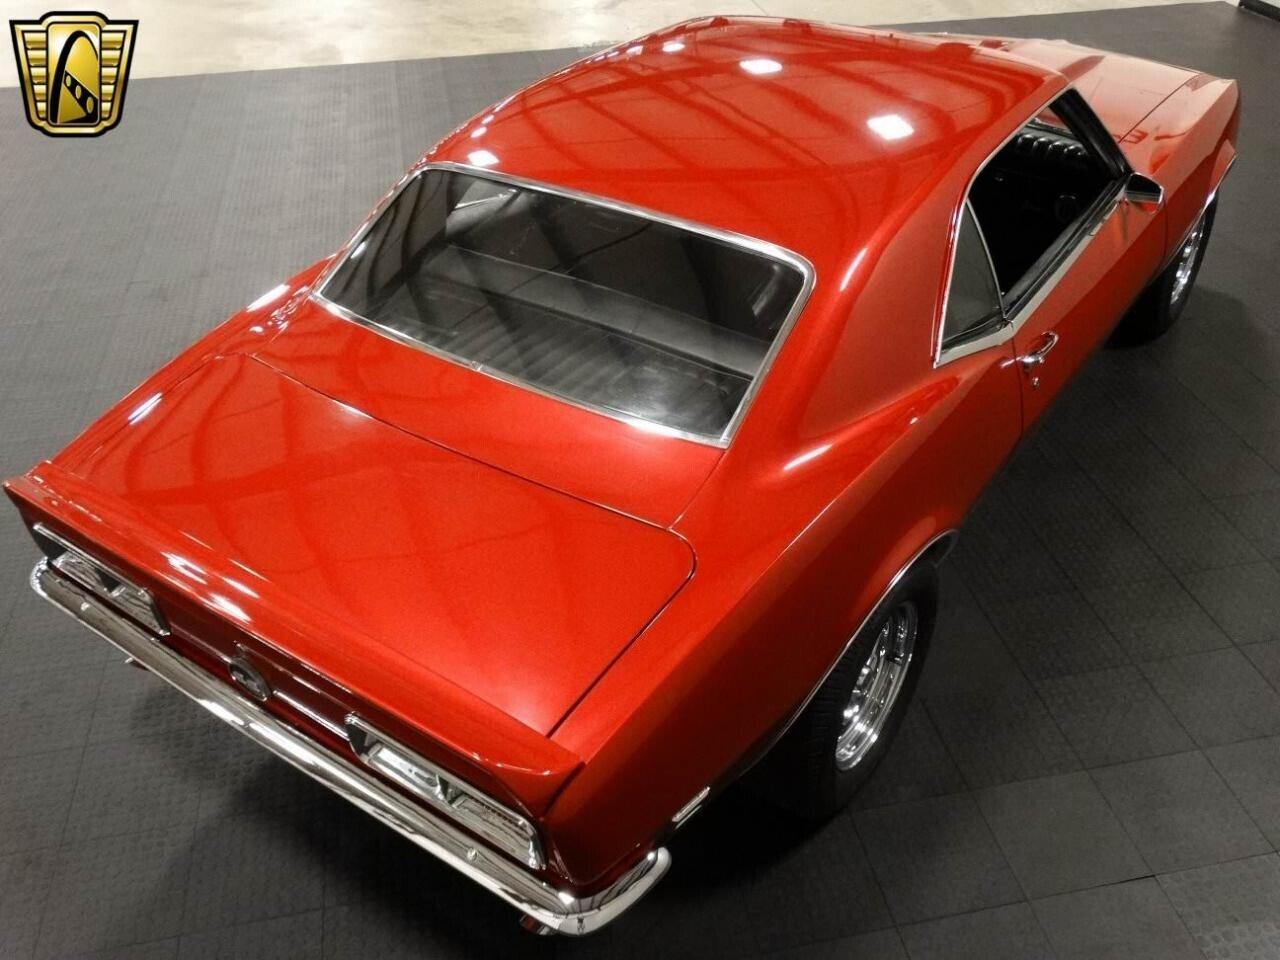 1968 Chevrolet Camaro For Sale Near Irvine California